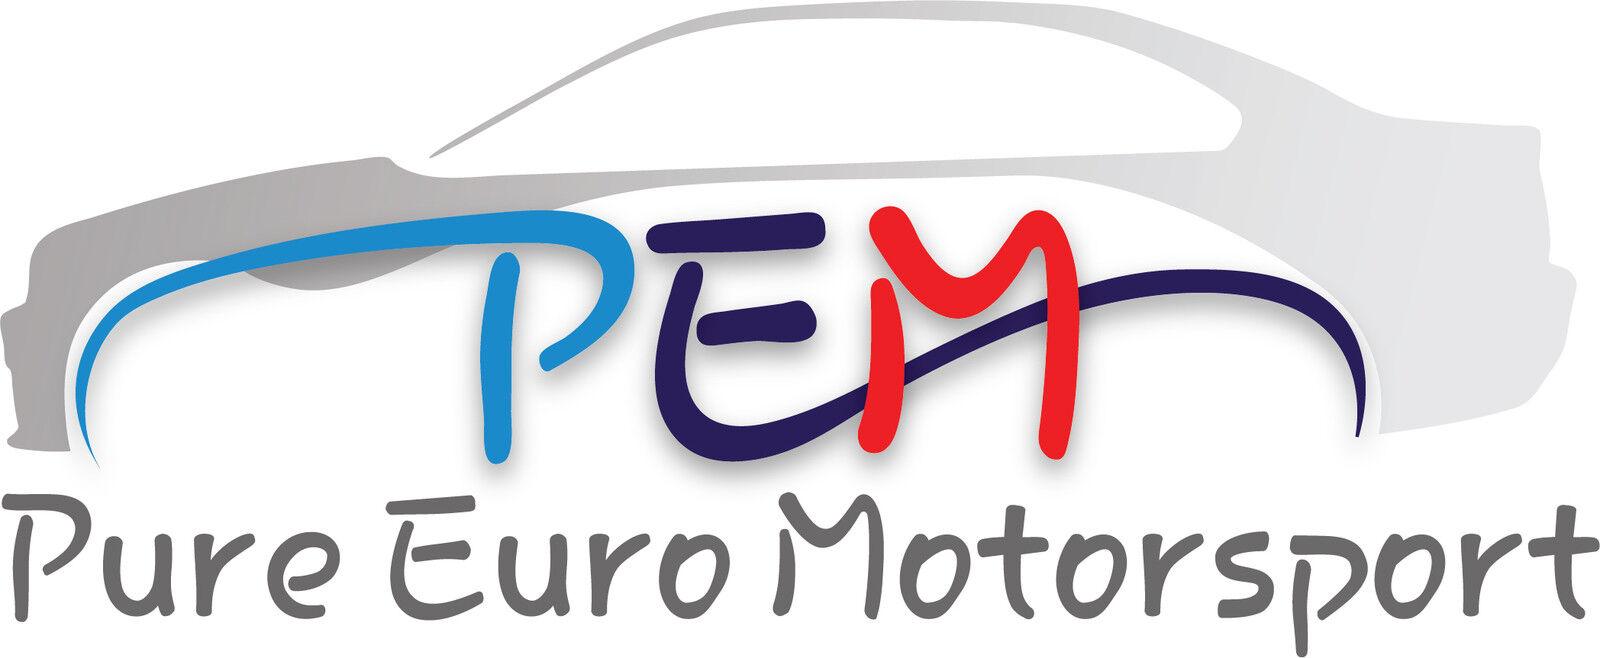 pure_euro_motorsport